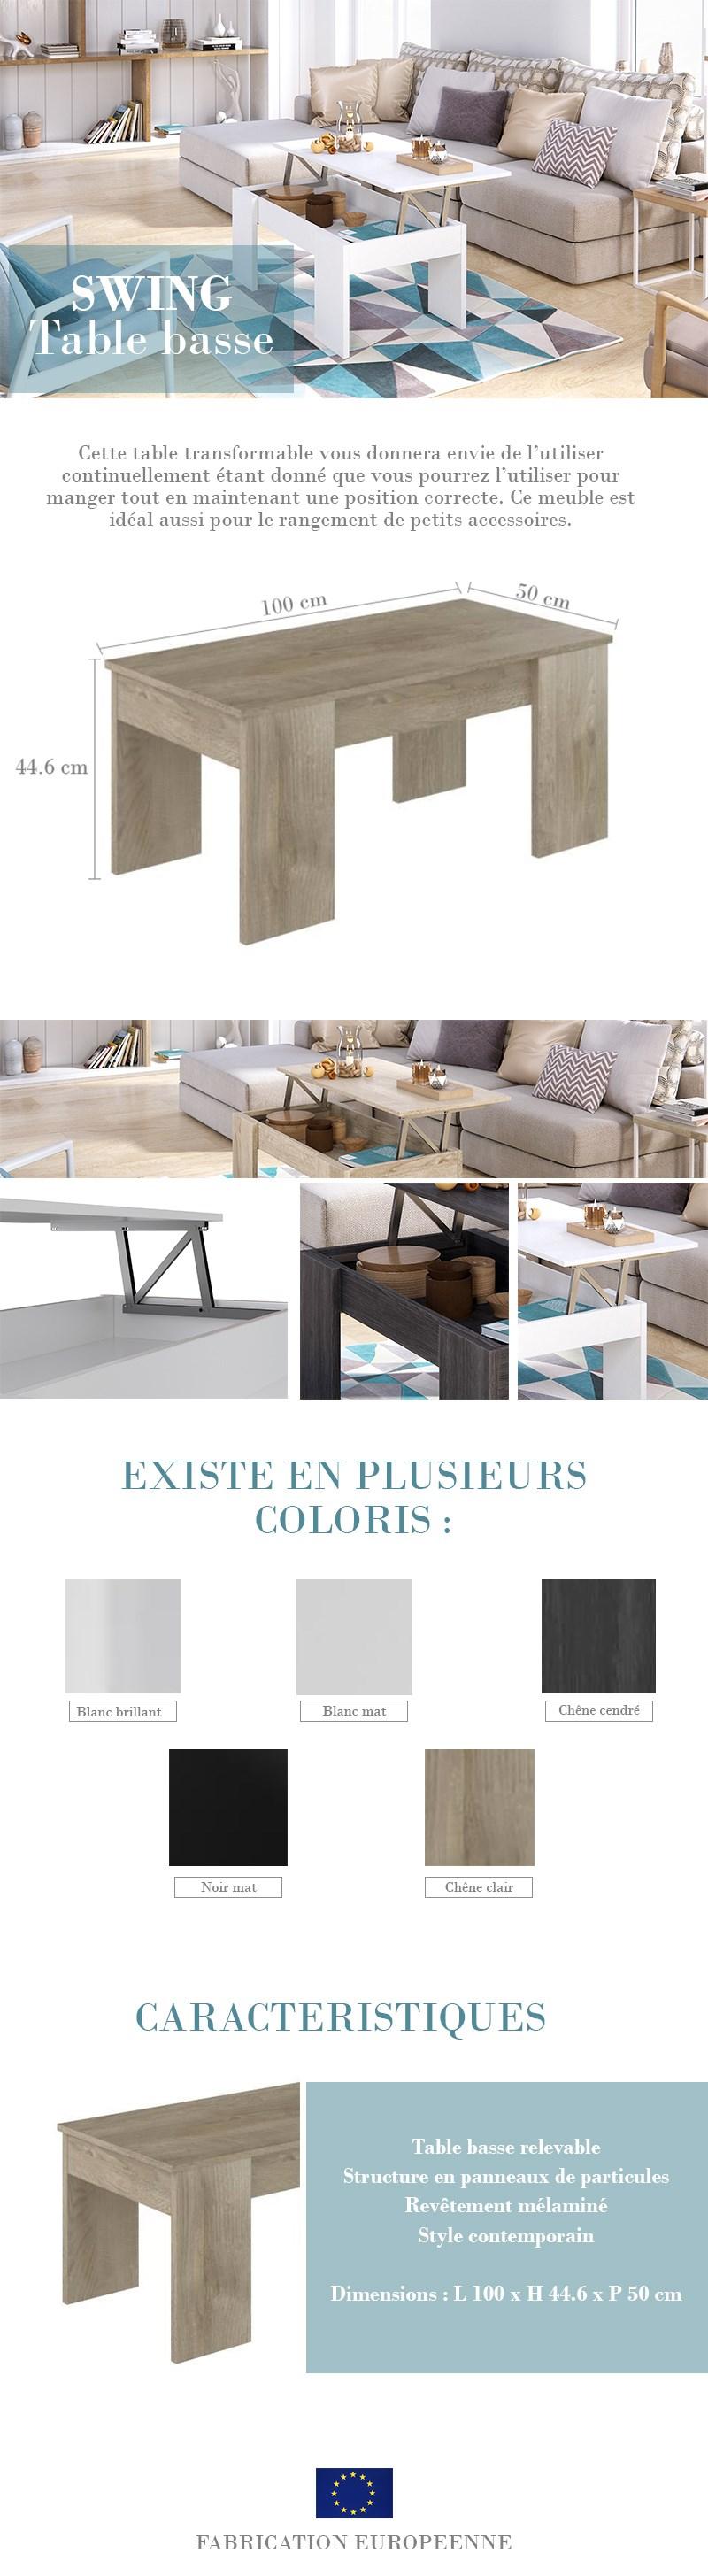 Swing table basse relevable style contemporain blanc brillant